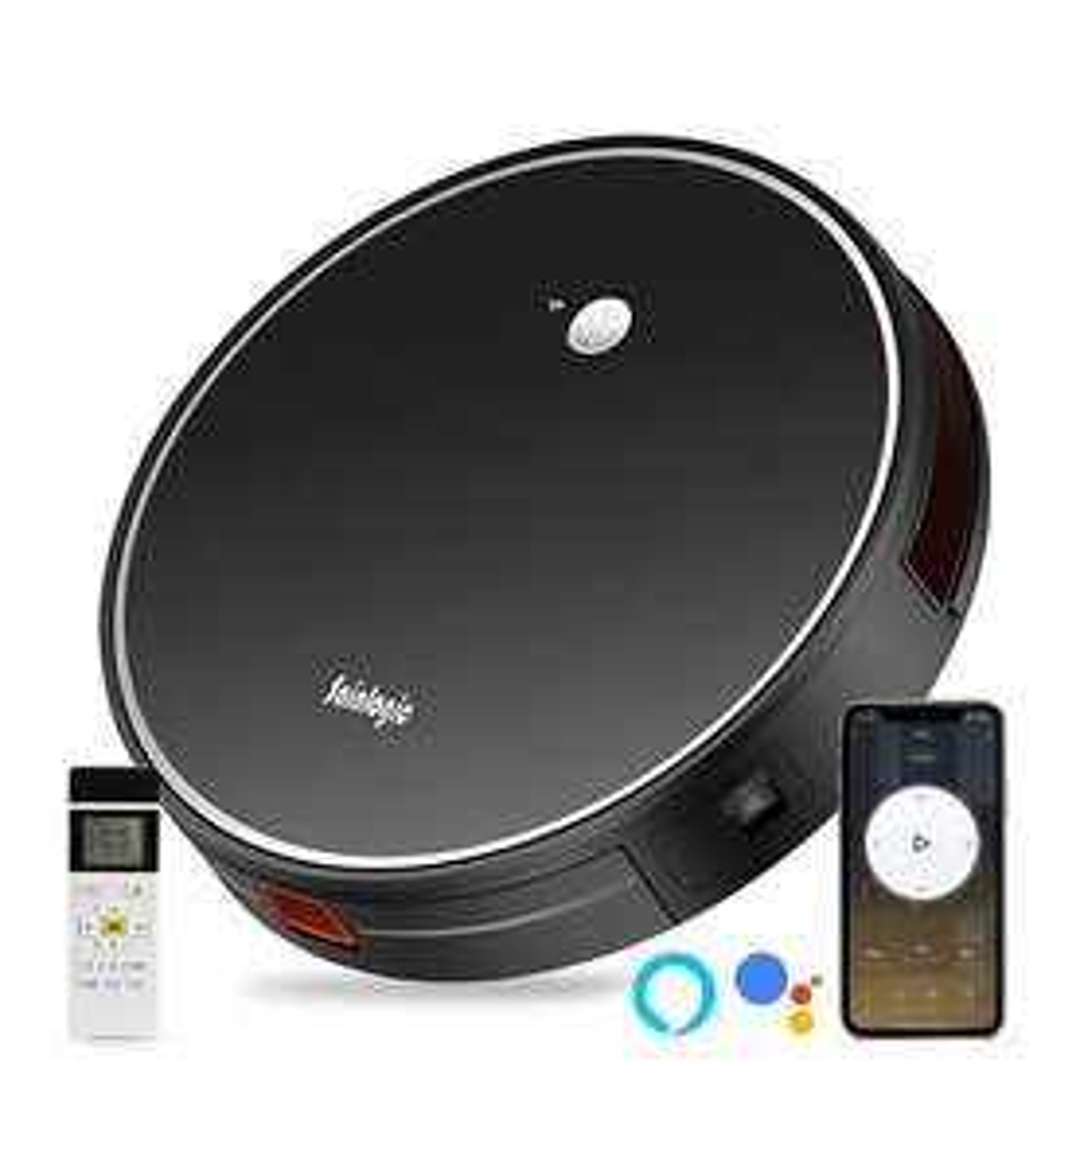 [Robotstofzuiger Smart] | 2500 PA | Google & Alexa assistant | Amazon.de